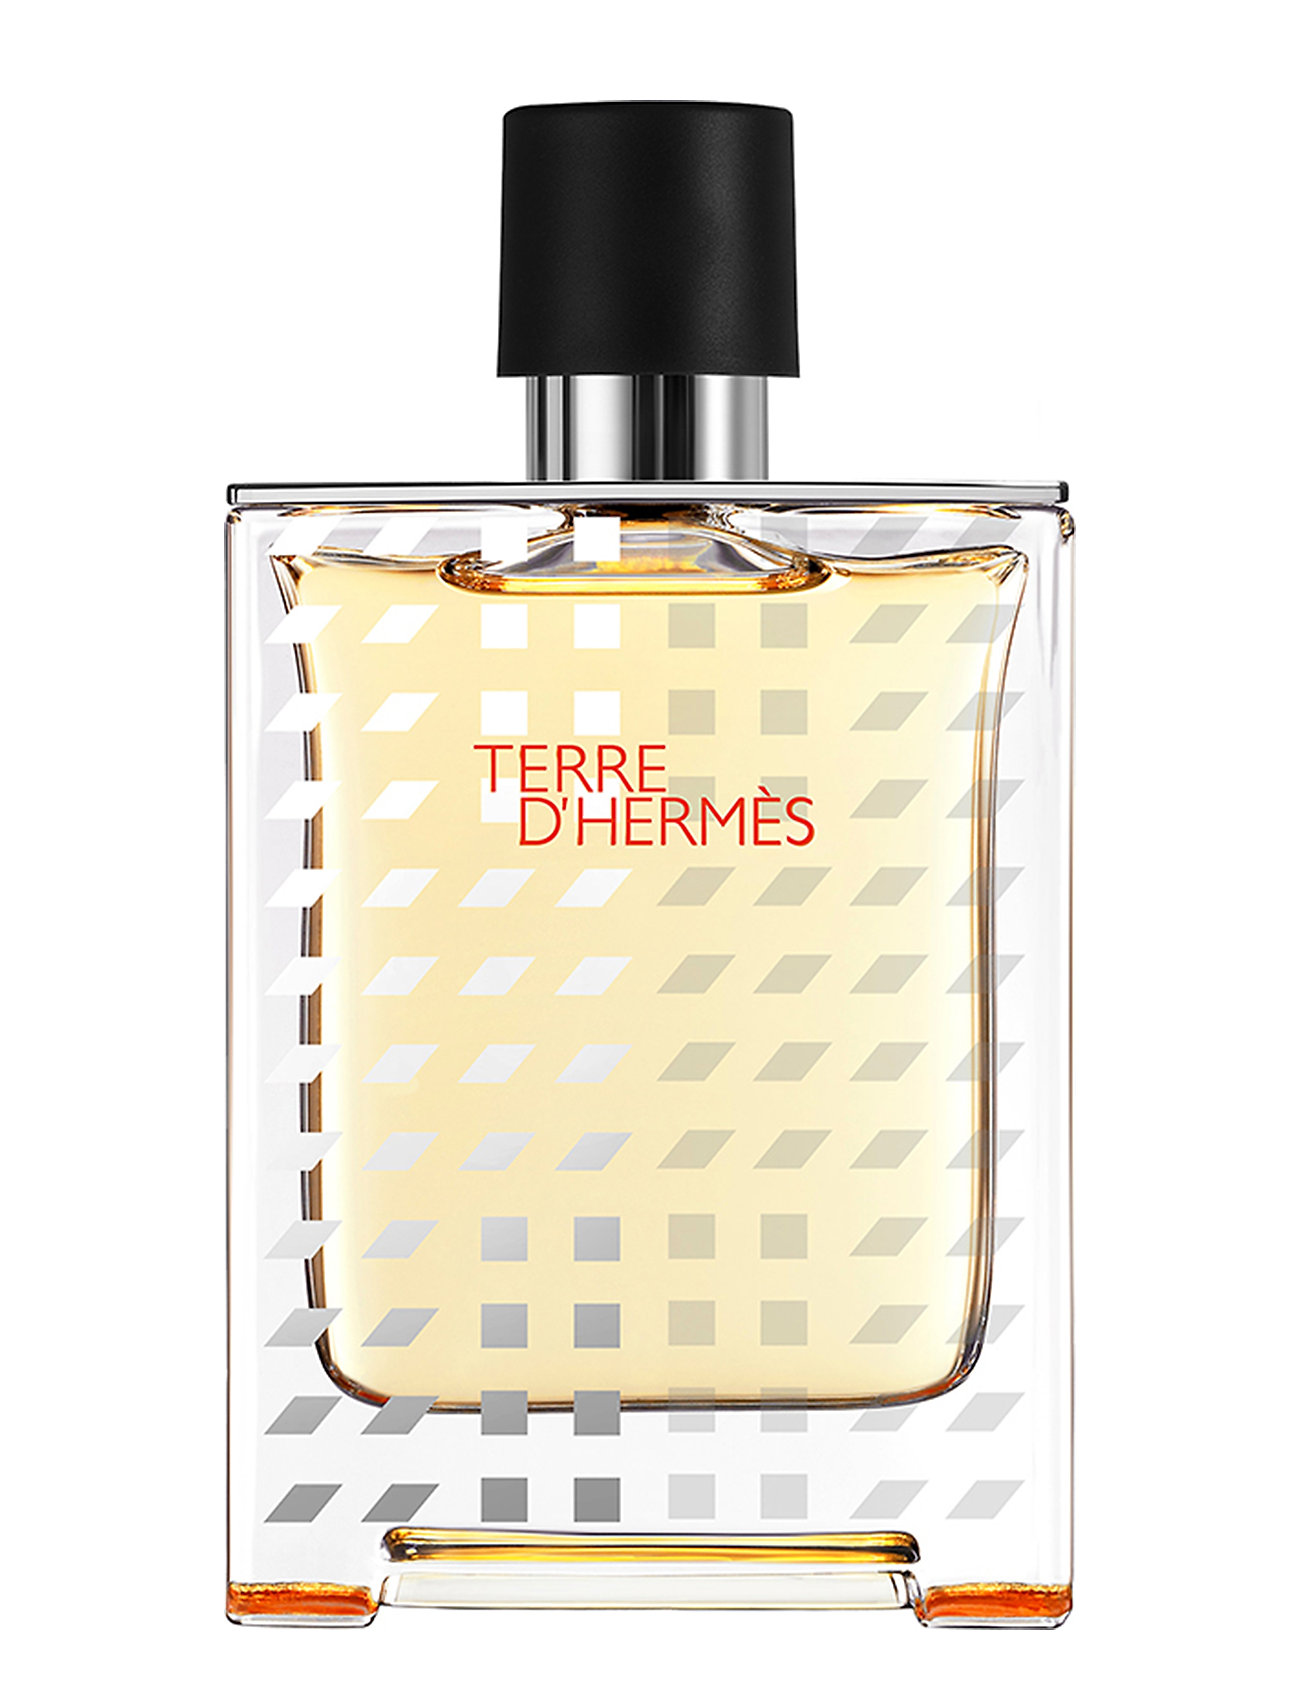 HERMÈS Terre d'Hermès 2019 Limited Edition 100 ml EDT - CLEAR